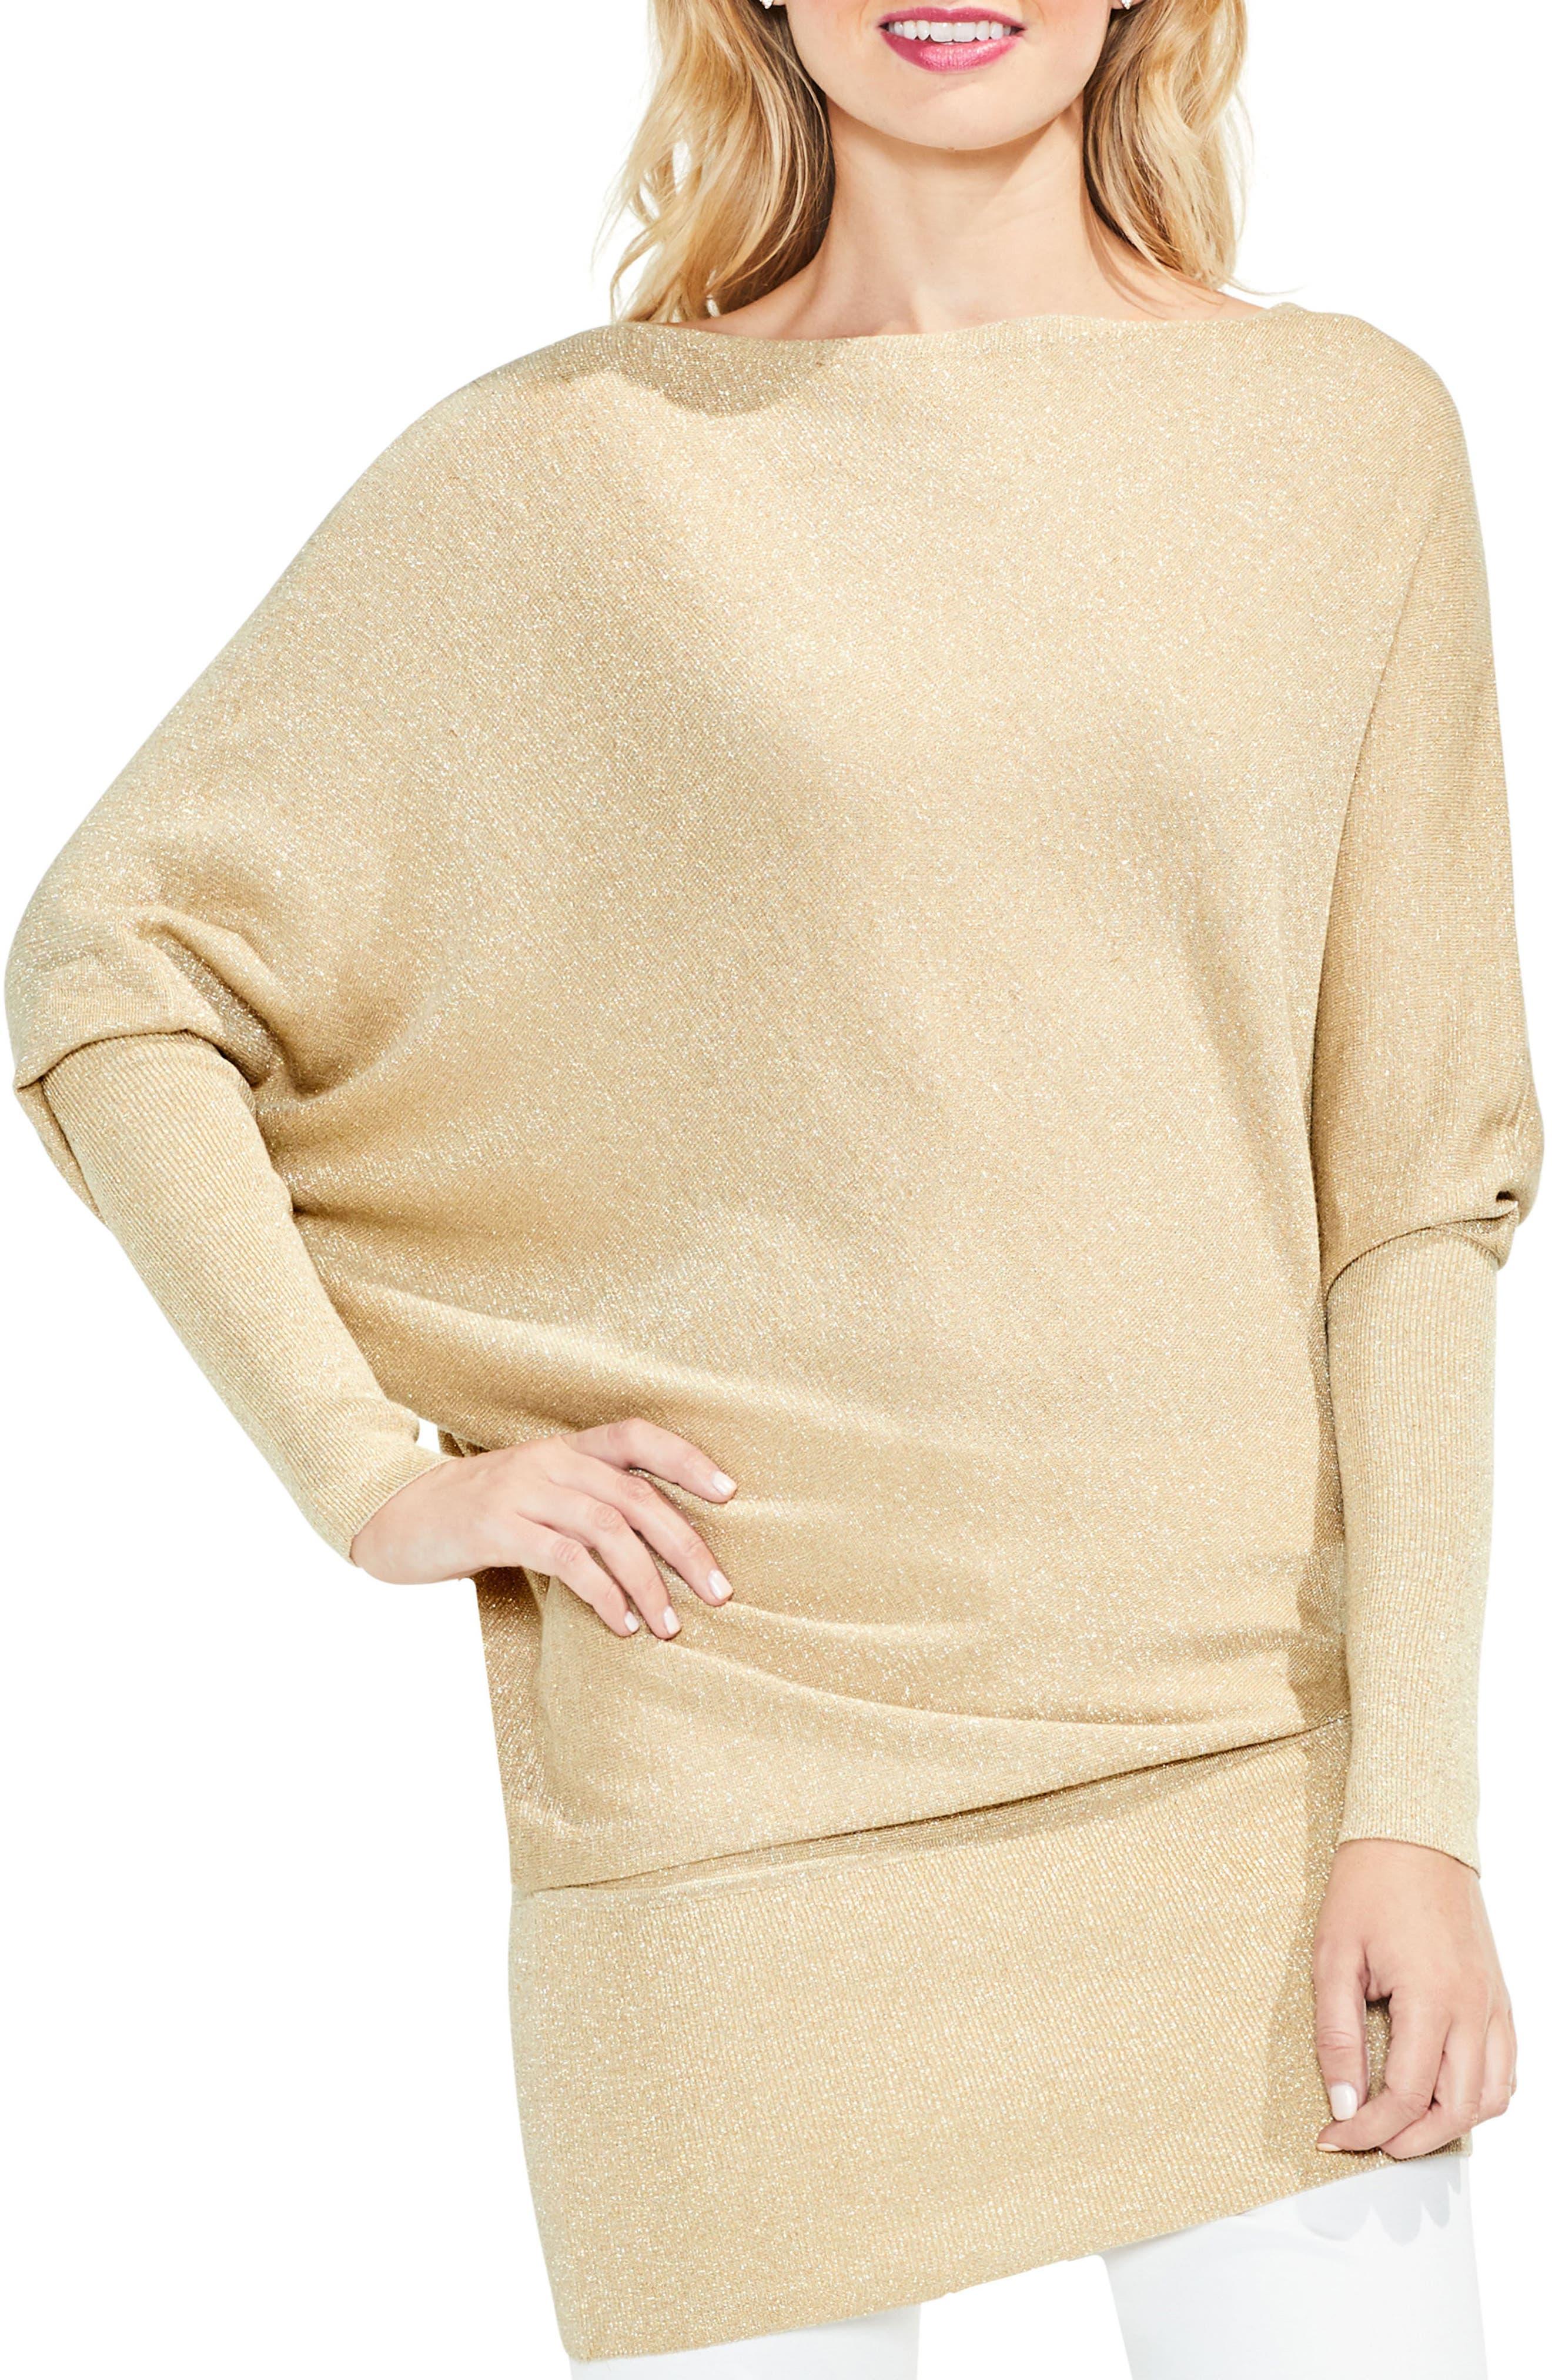 Vince Camuto Batwing Sleeve Metallic Sweater